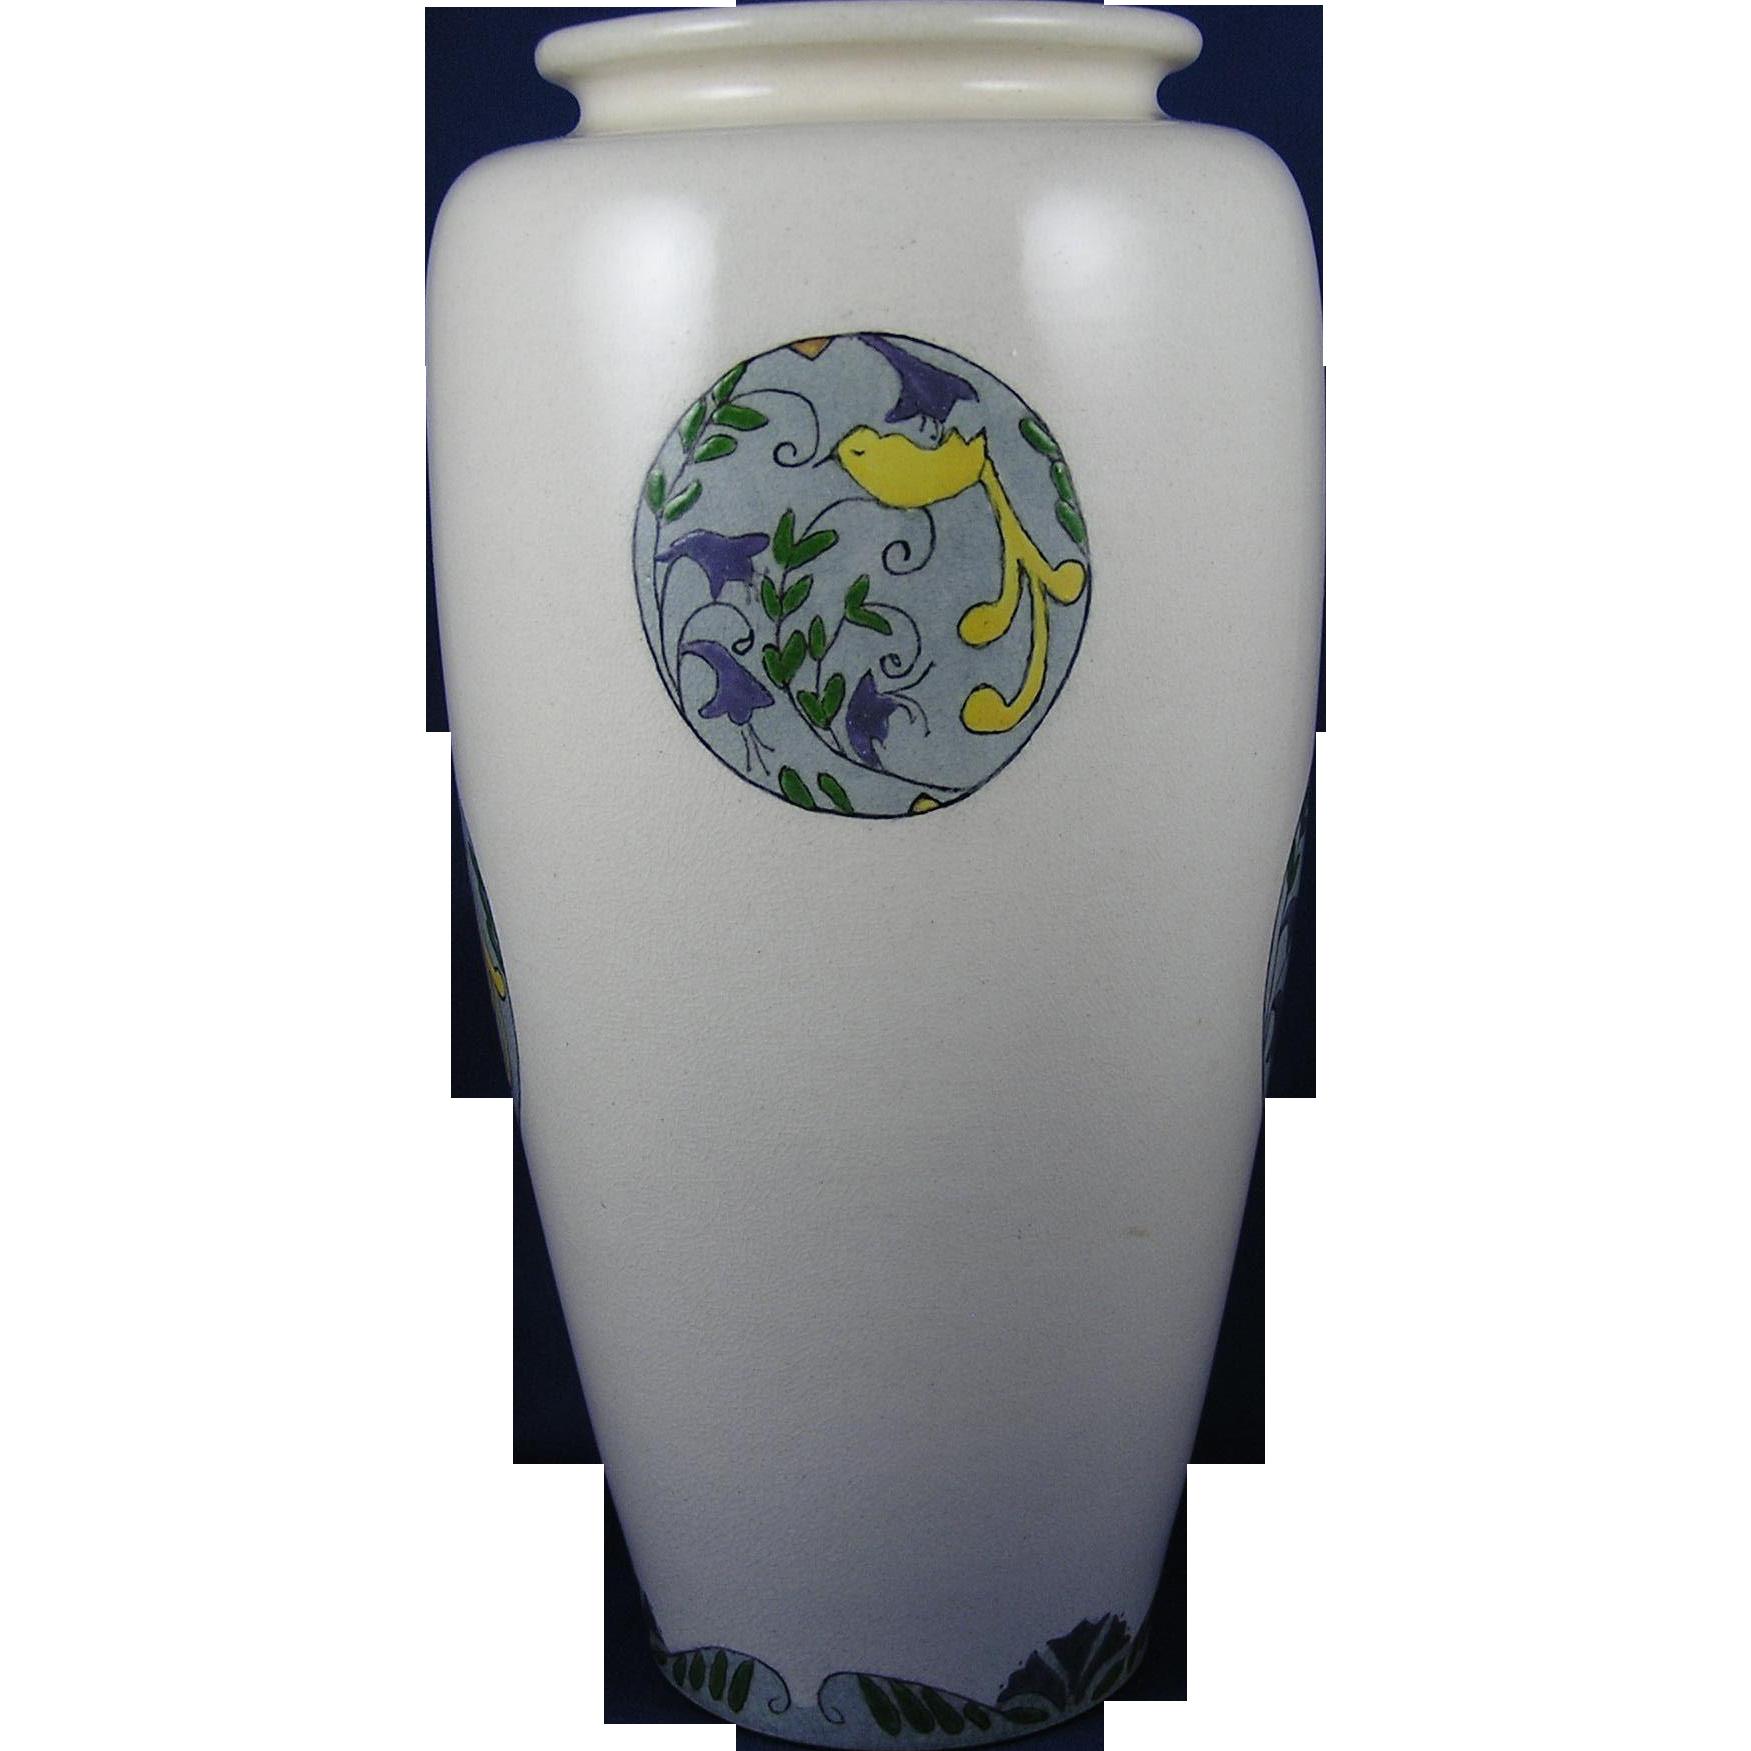 American Satsuma Arts & Crafts Bird & Floral Medallions Design Vase (Signed /Dated 1922) - Keramic Studio Design